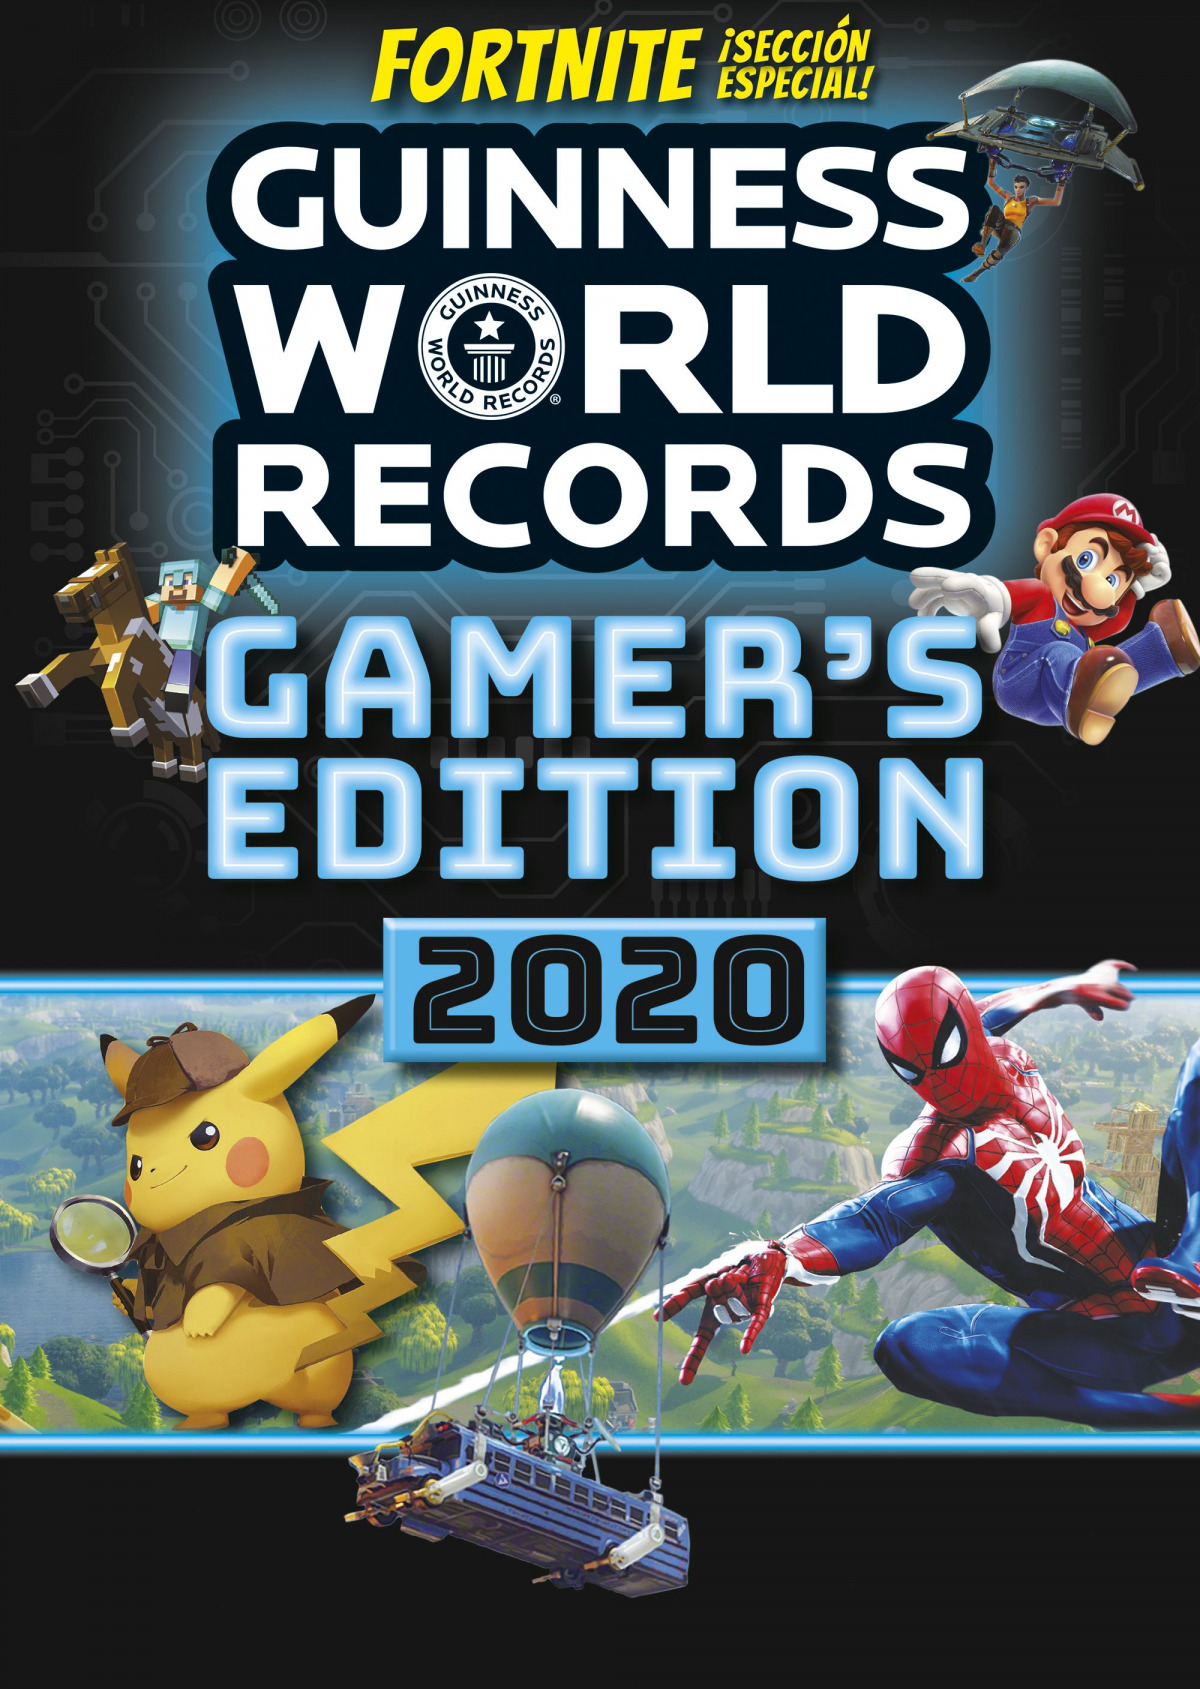 GUINNESS 2020 WORLD RECORDS 9788408212911